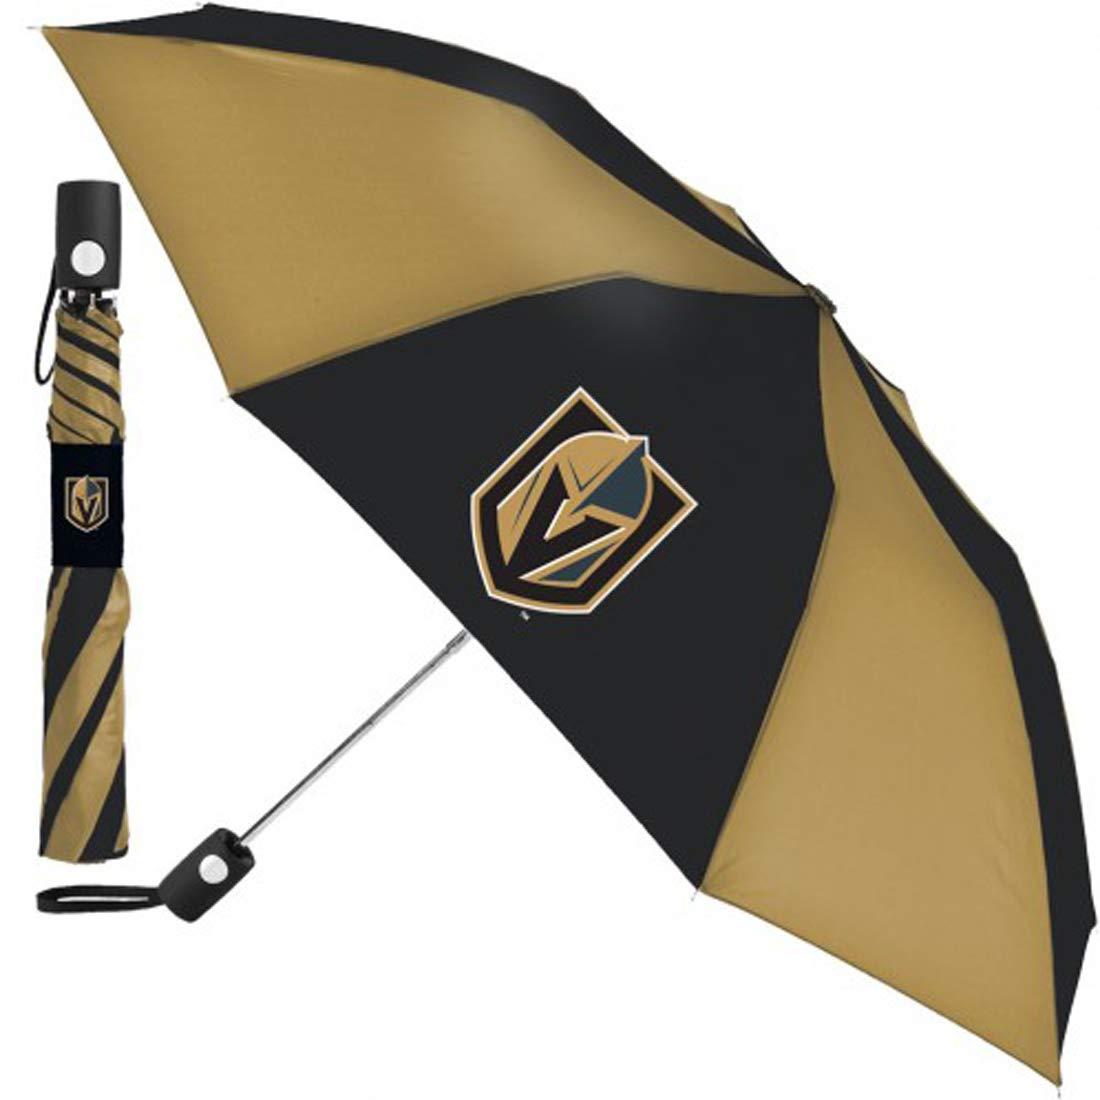 WinCraft NHL Las Vegas Golden Knights Umbrella 42 inches Automatic Folding